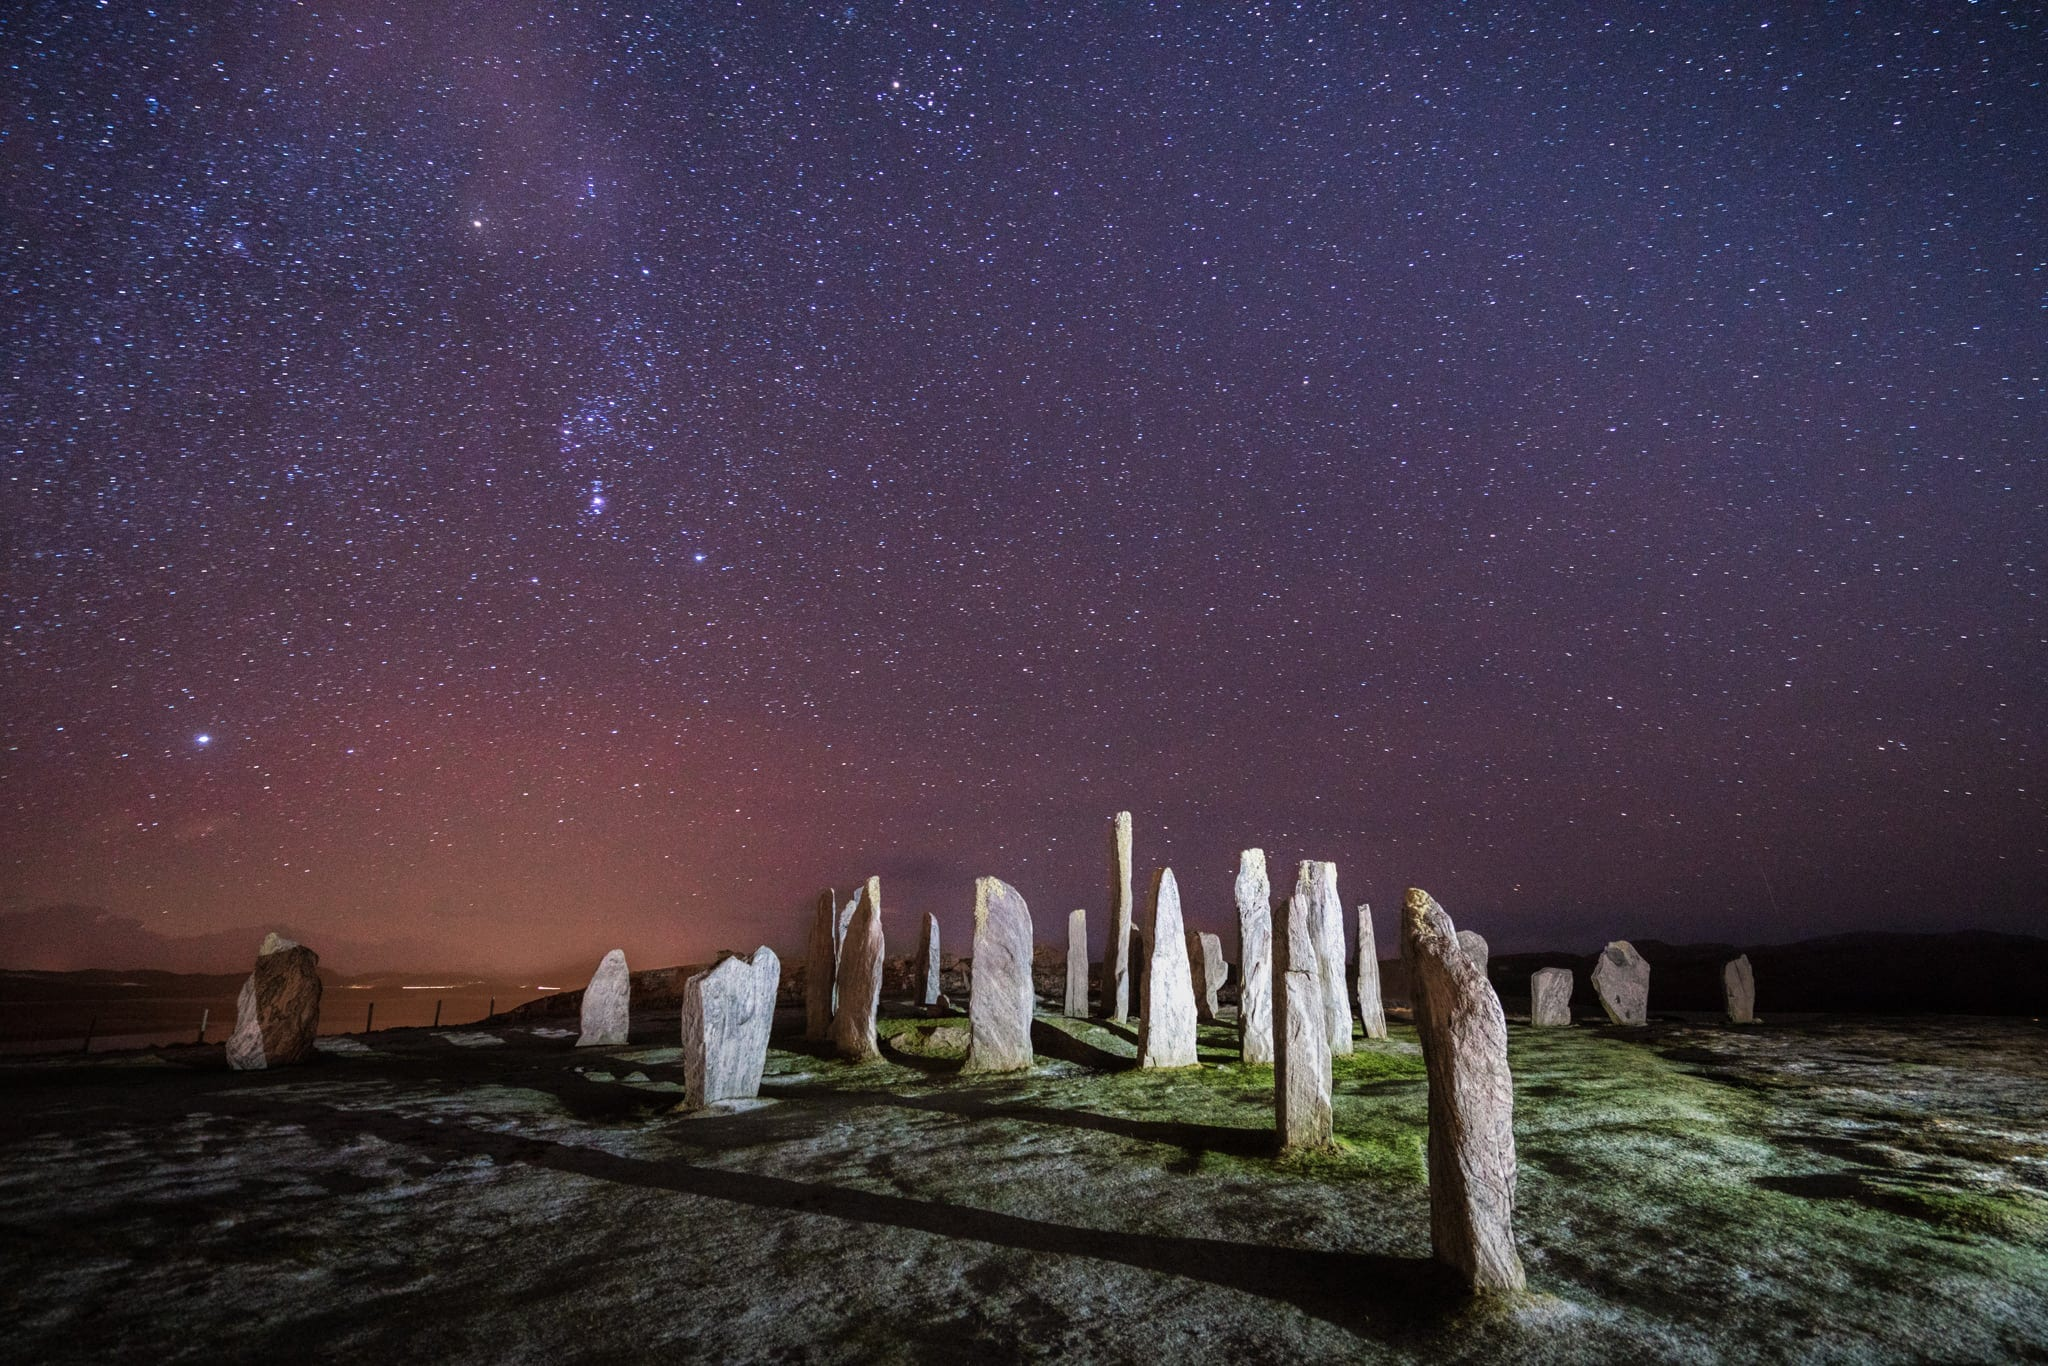 Callanish Standing Stones Night Sky - Scotland Landscape Photography